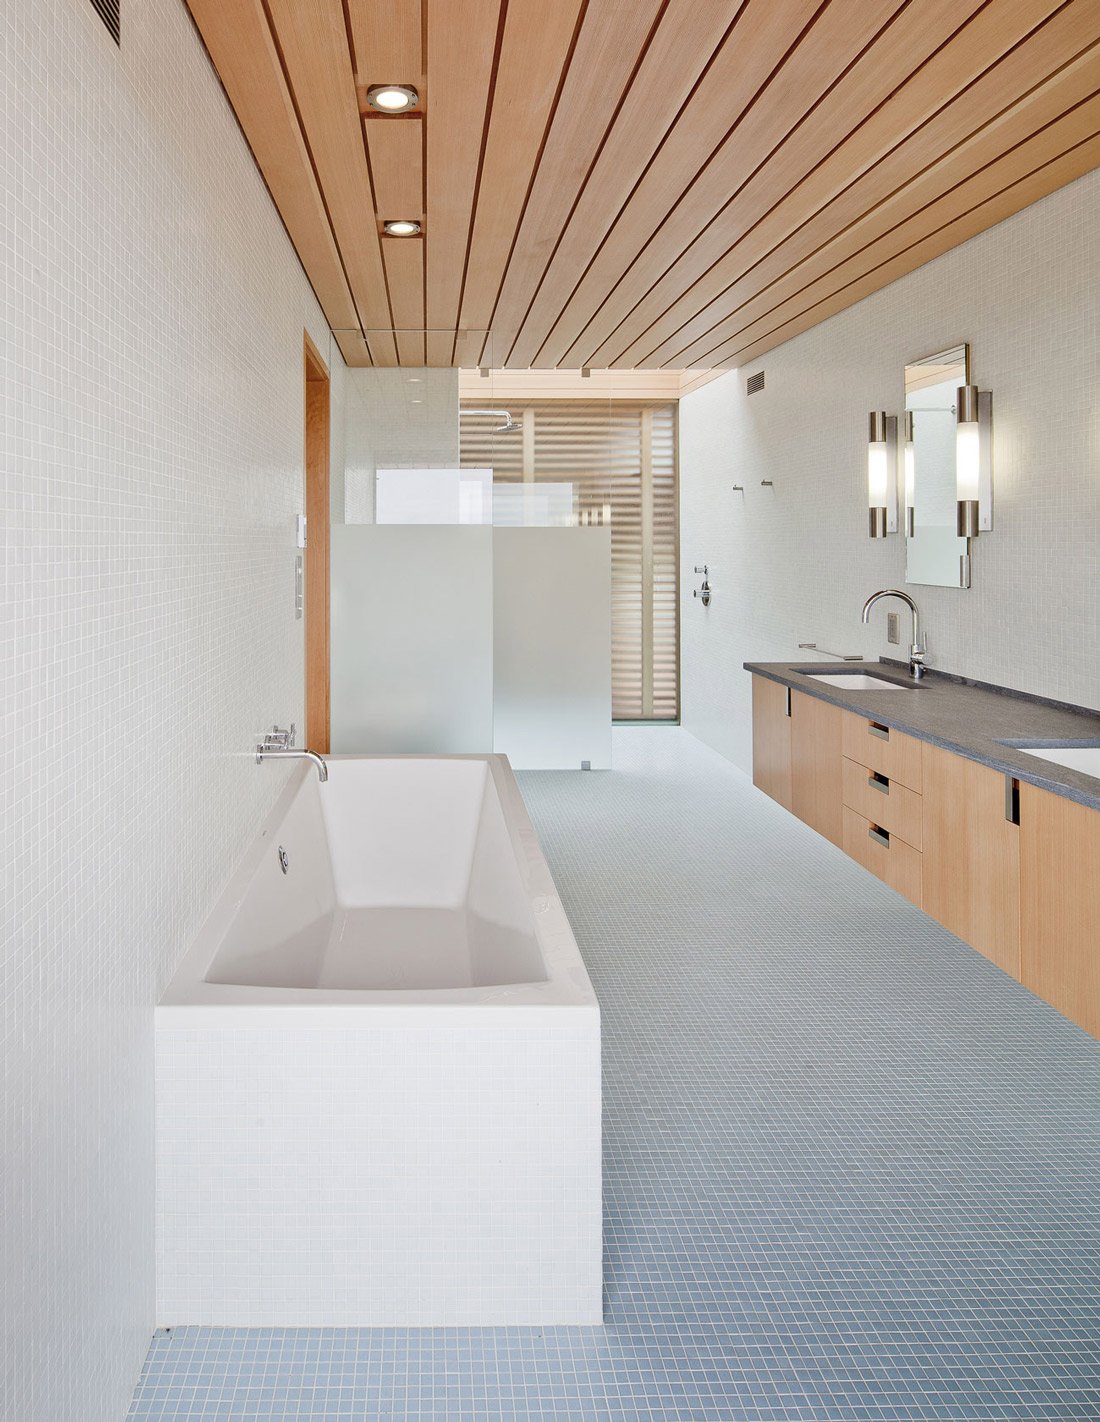 Bathroom, Bath, Home in Edgartown, Massachusetts